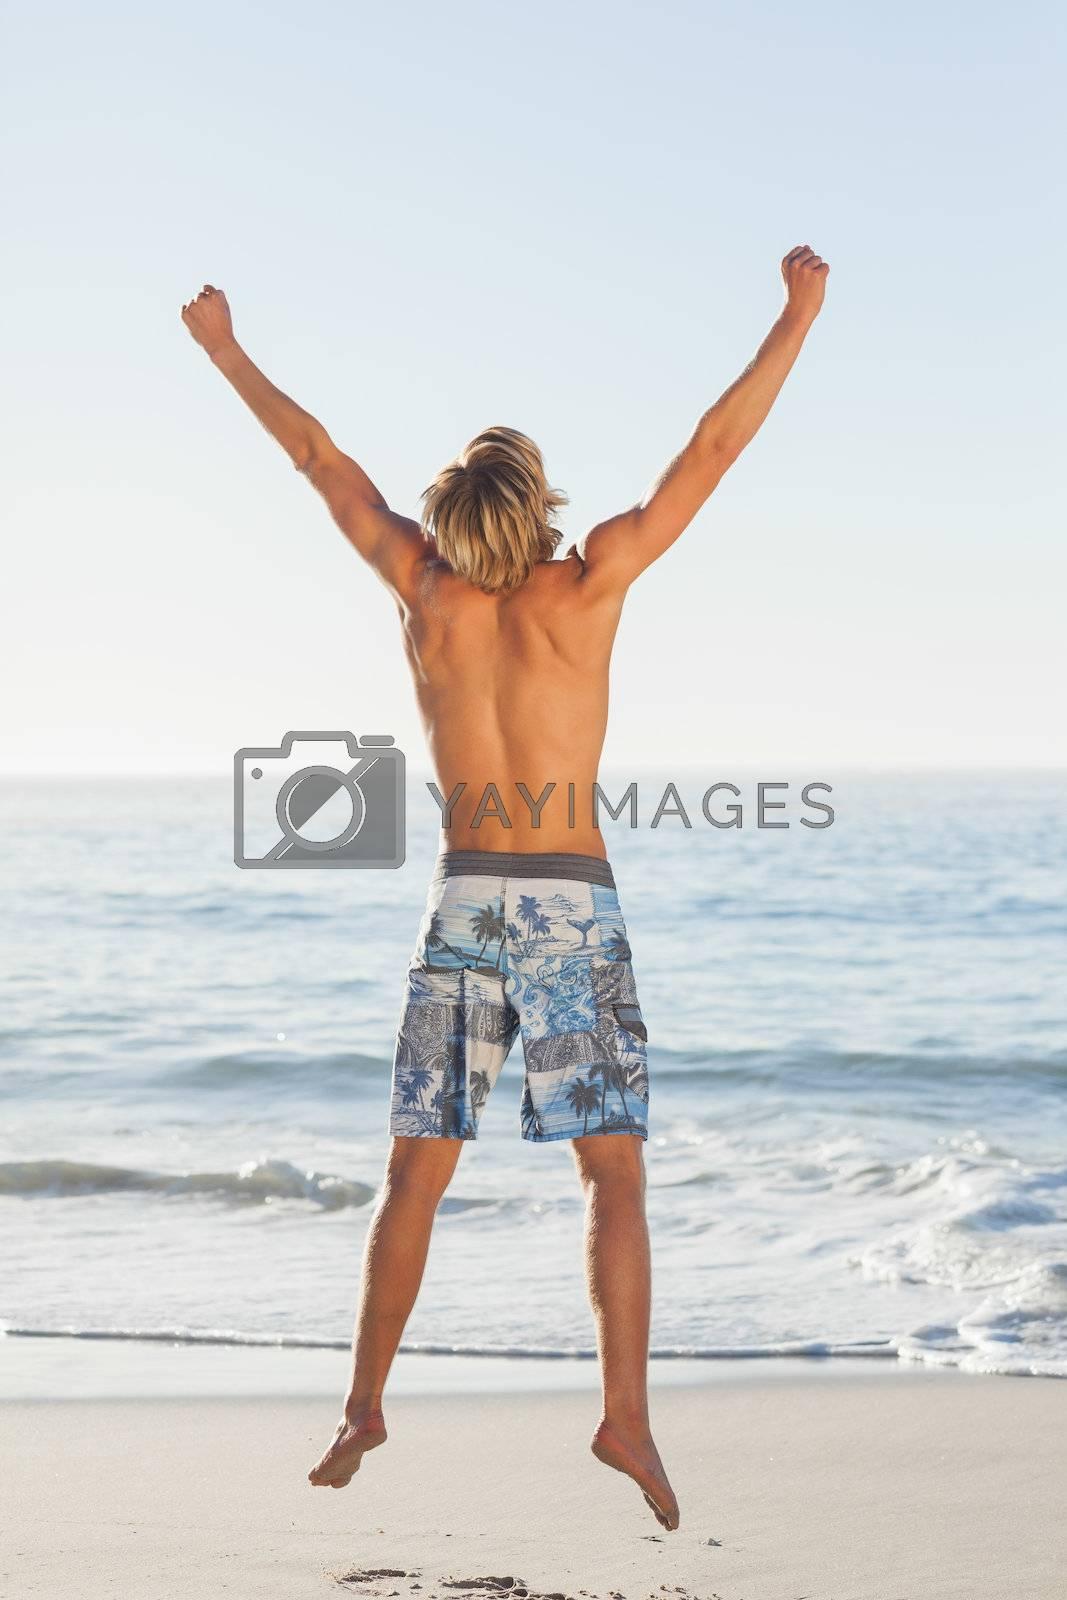 Blonde man jumping by Wavebreakmedia